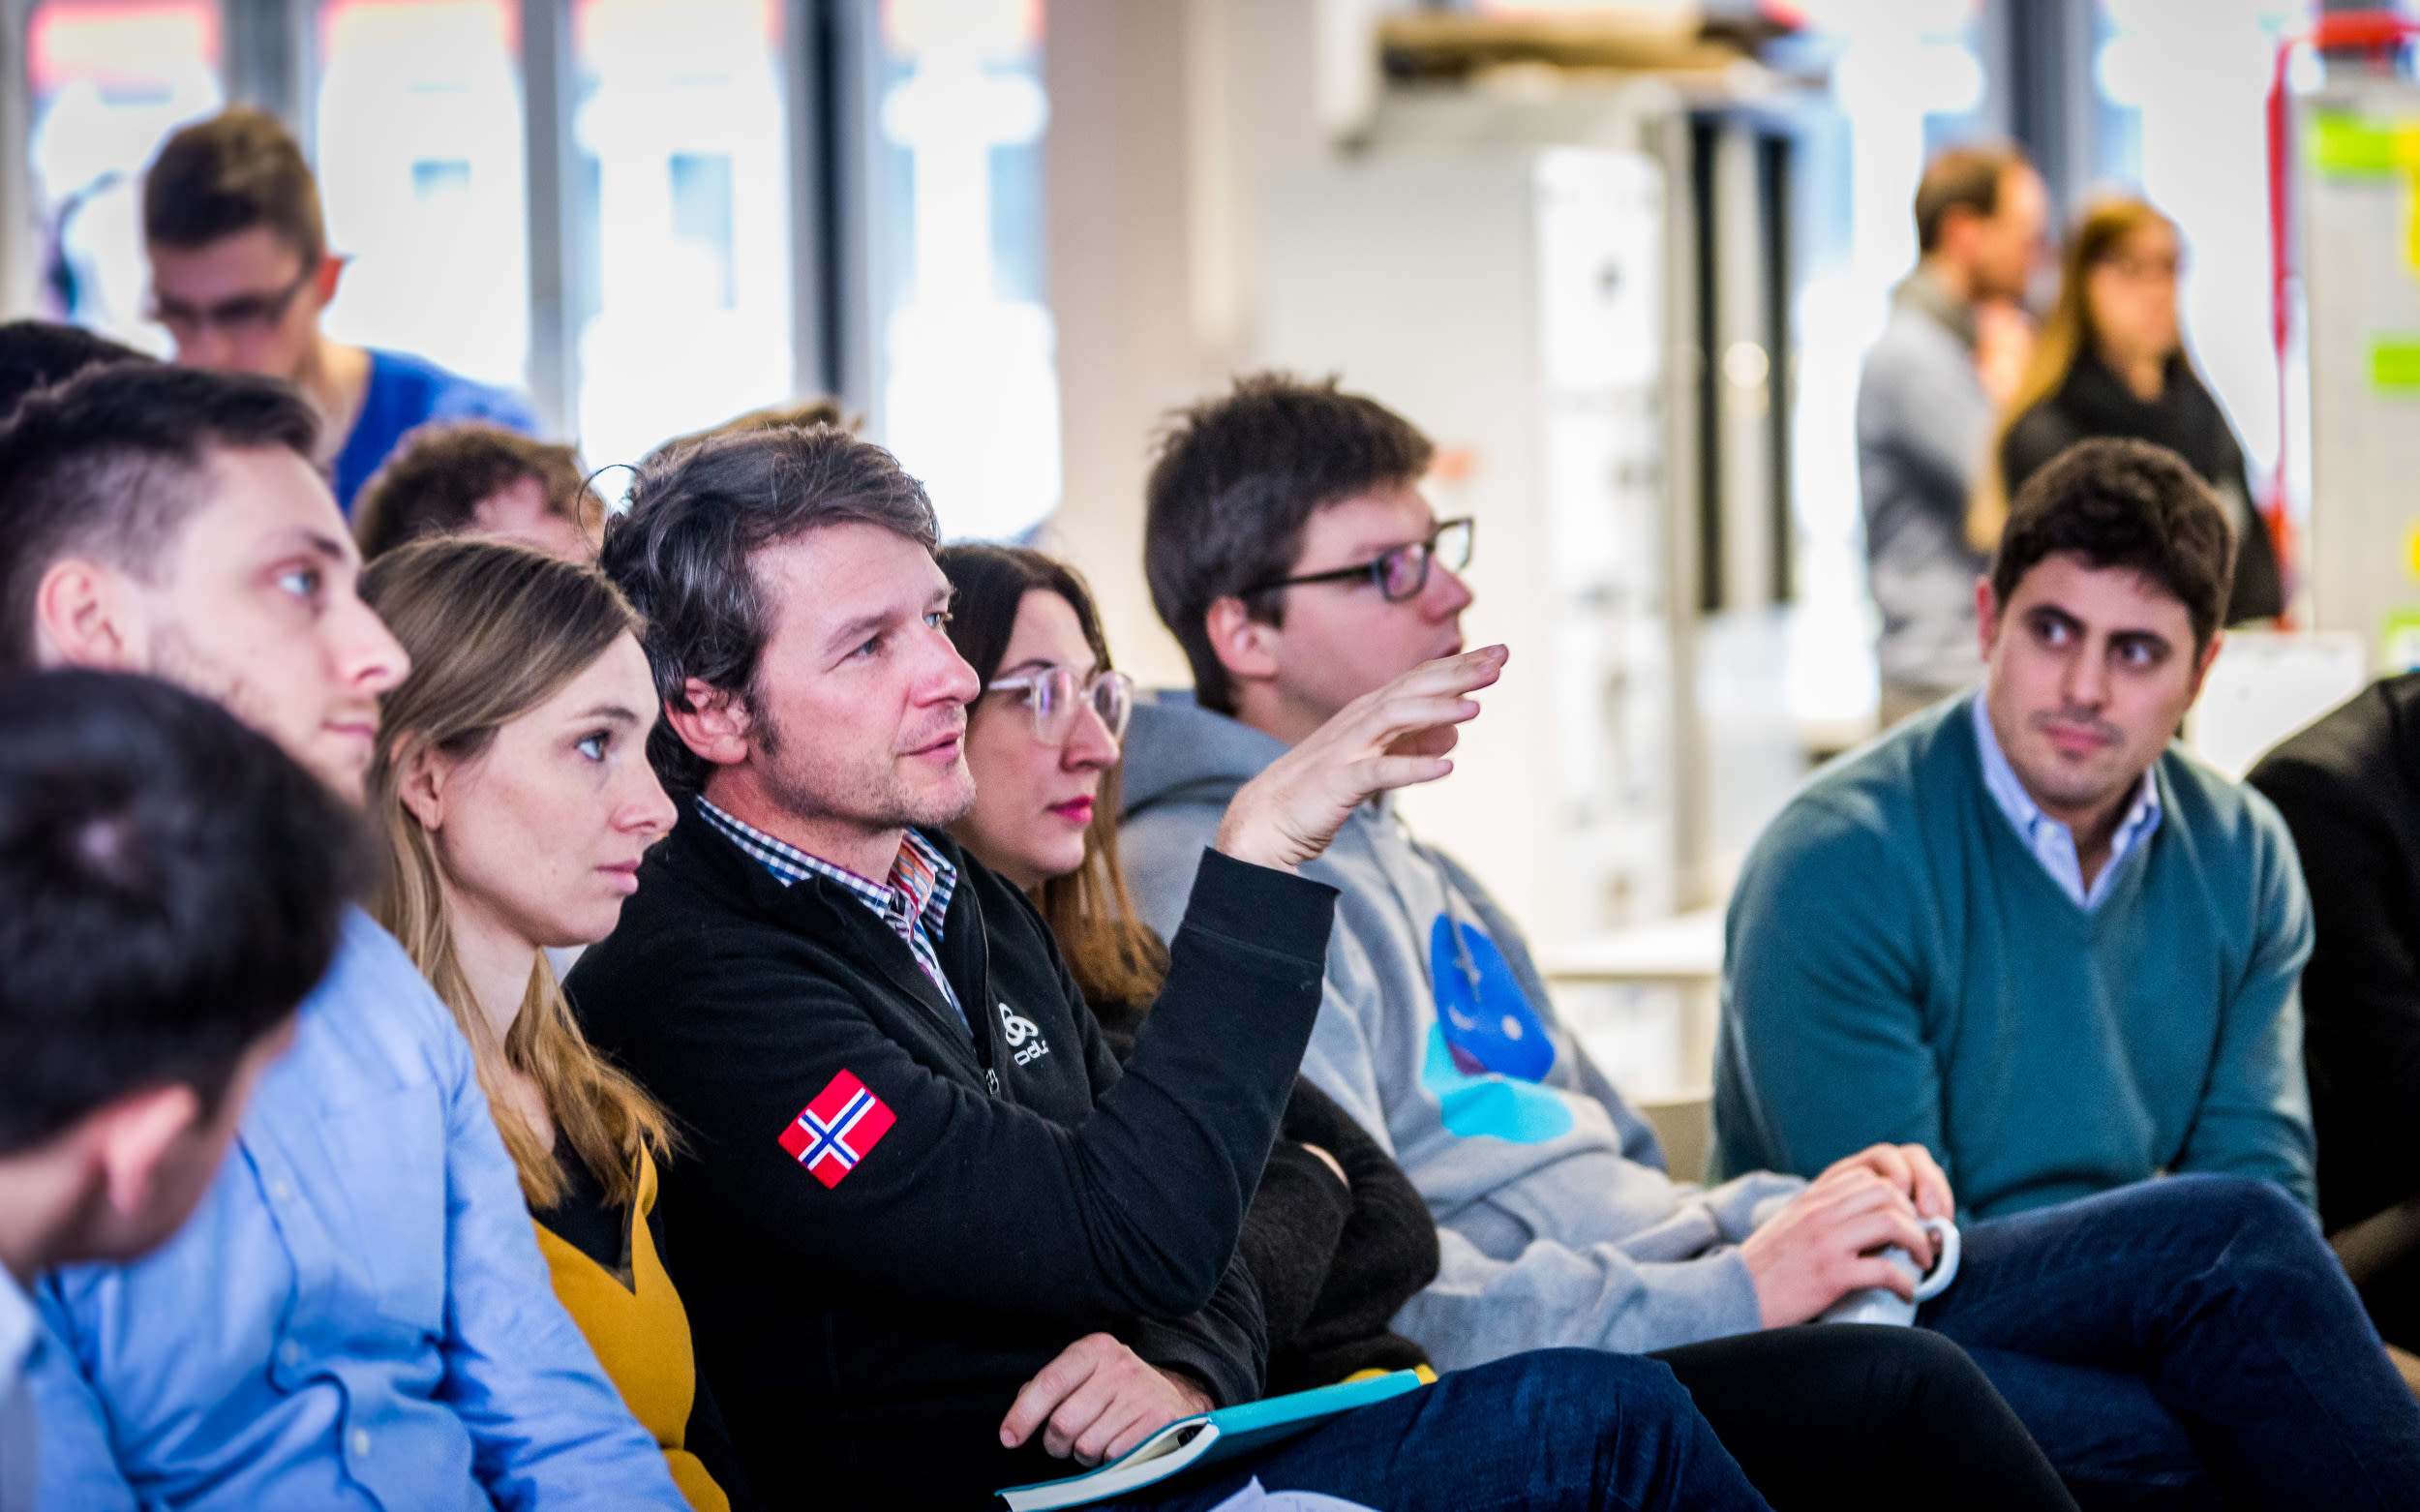 Awin i Axel Springer Plug&Play dla startupów